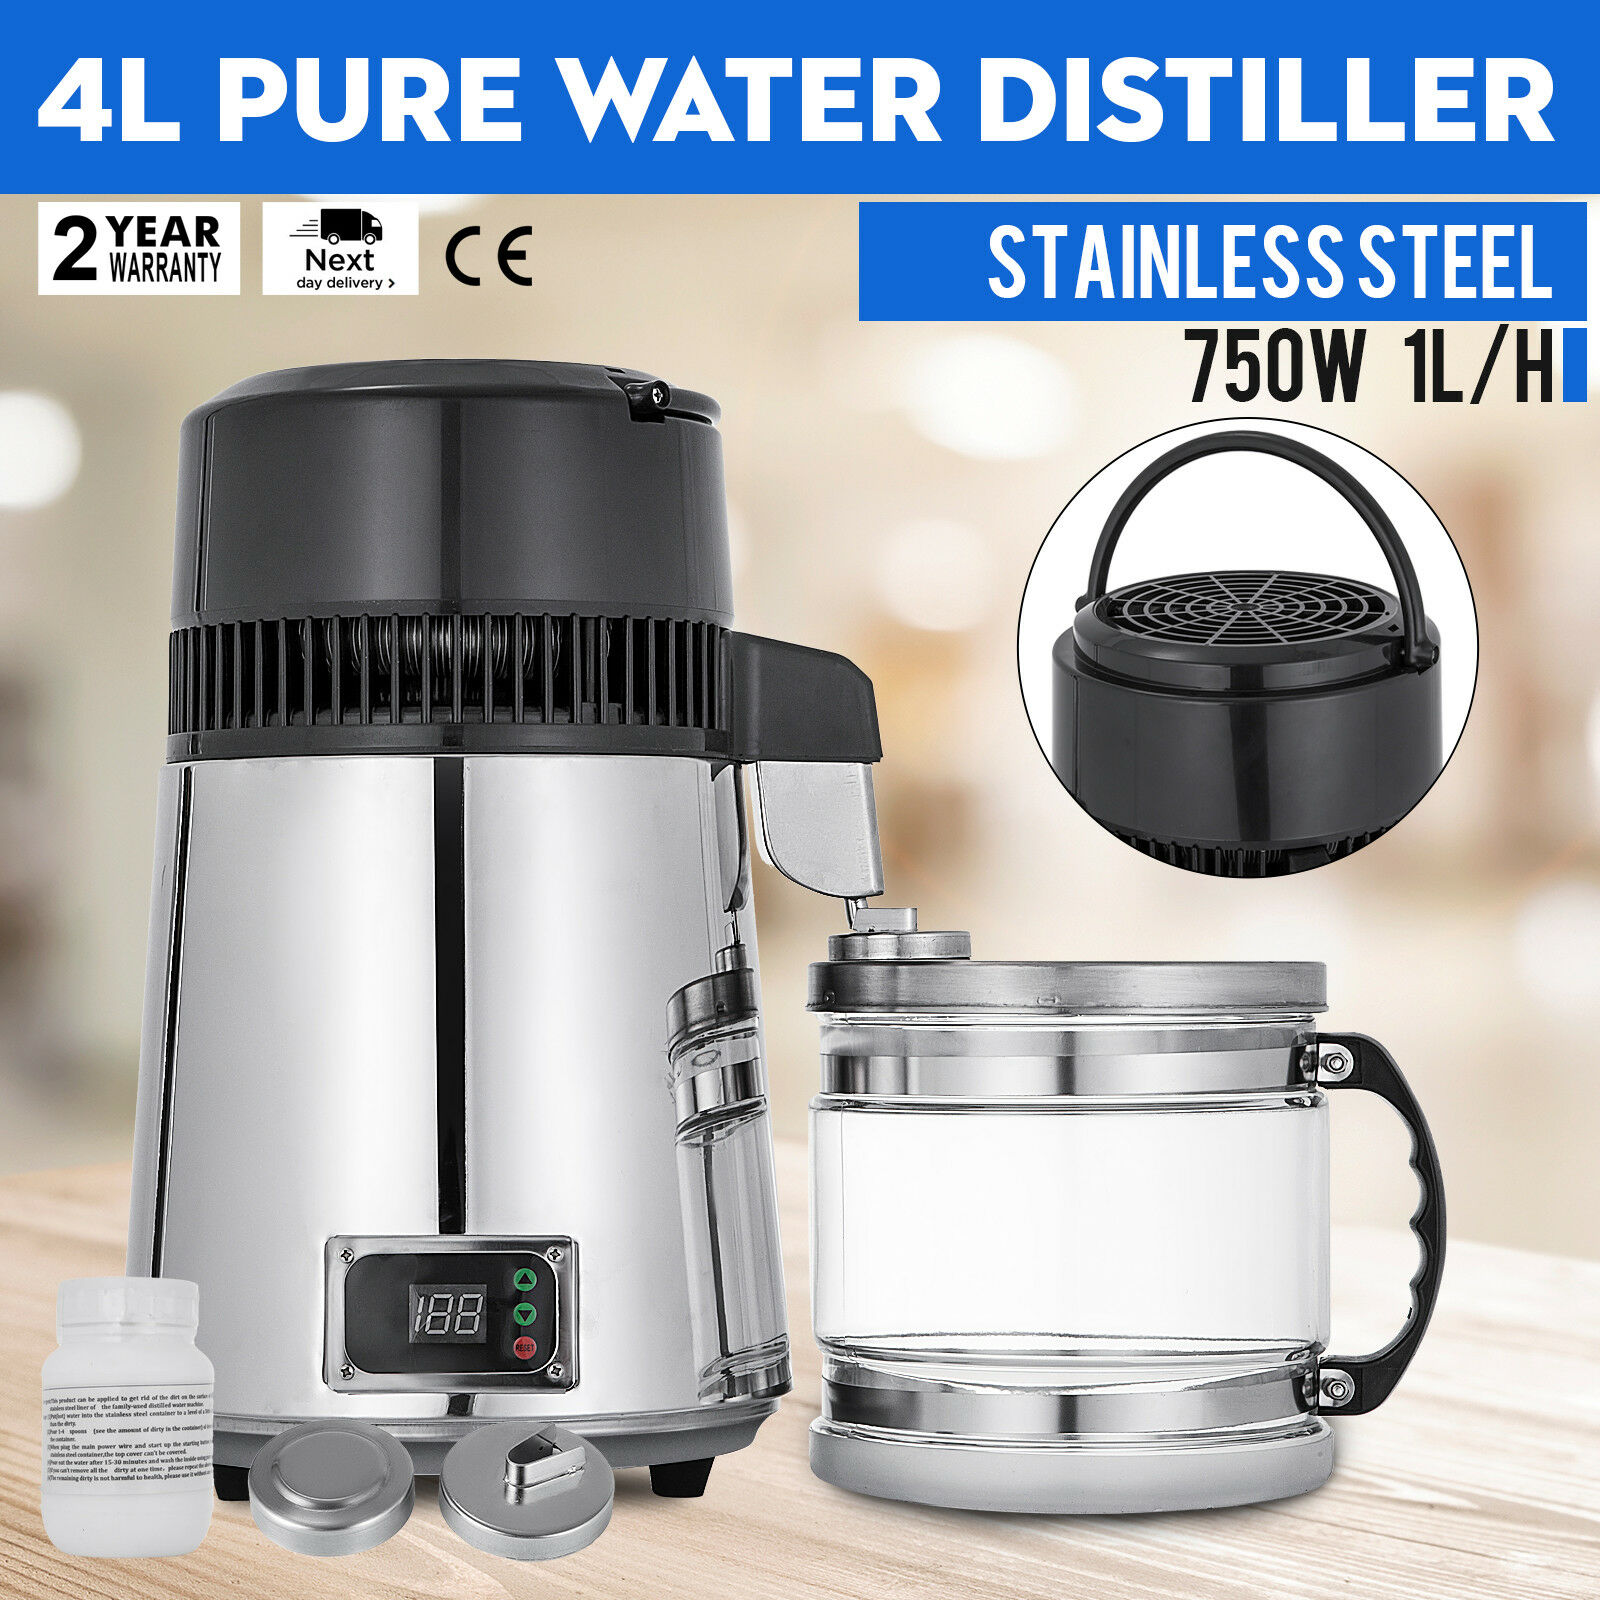 4L Water Distiller Temperature Controlled Premium Countertop Alcohol Purifier